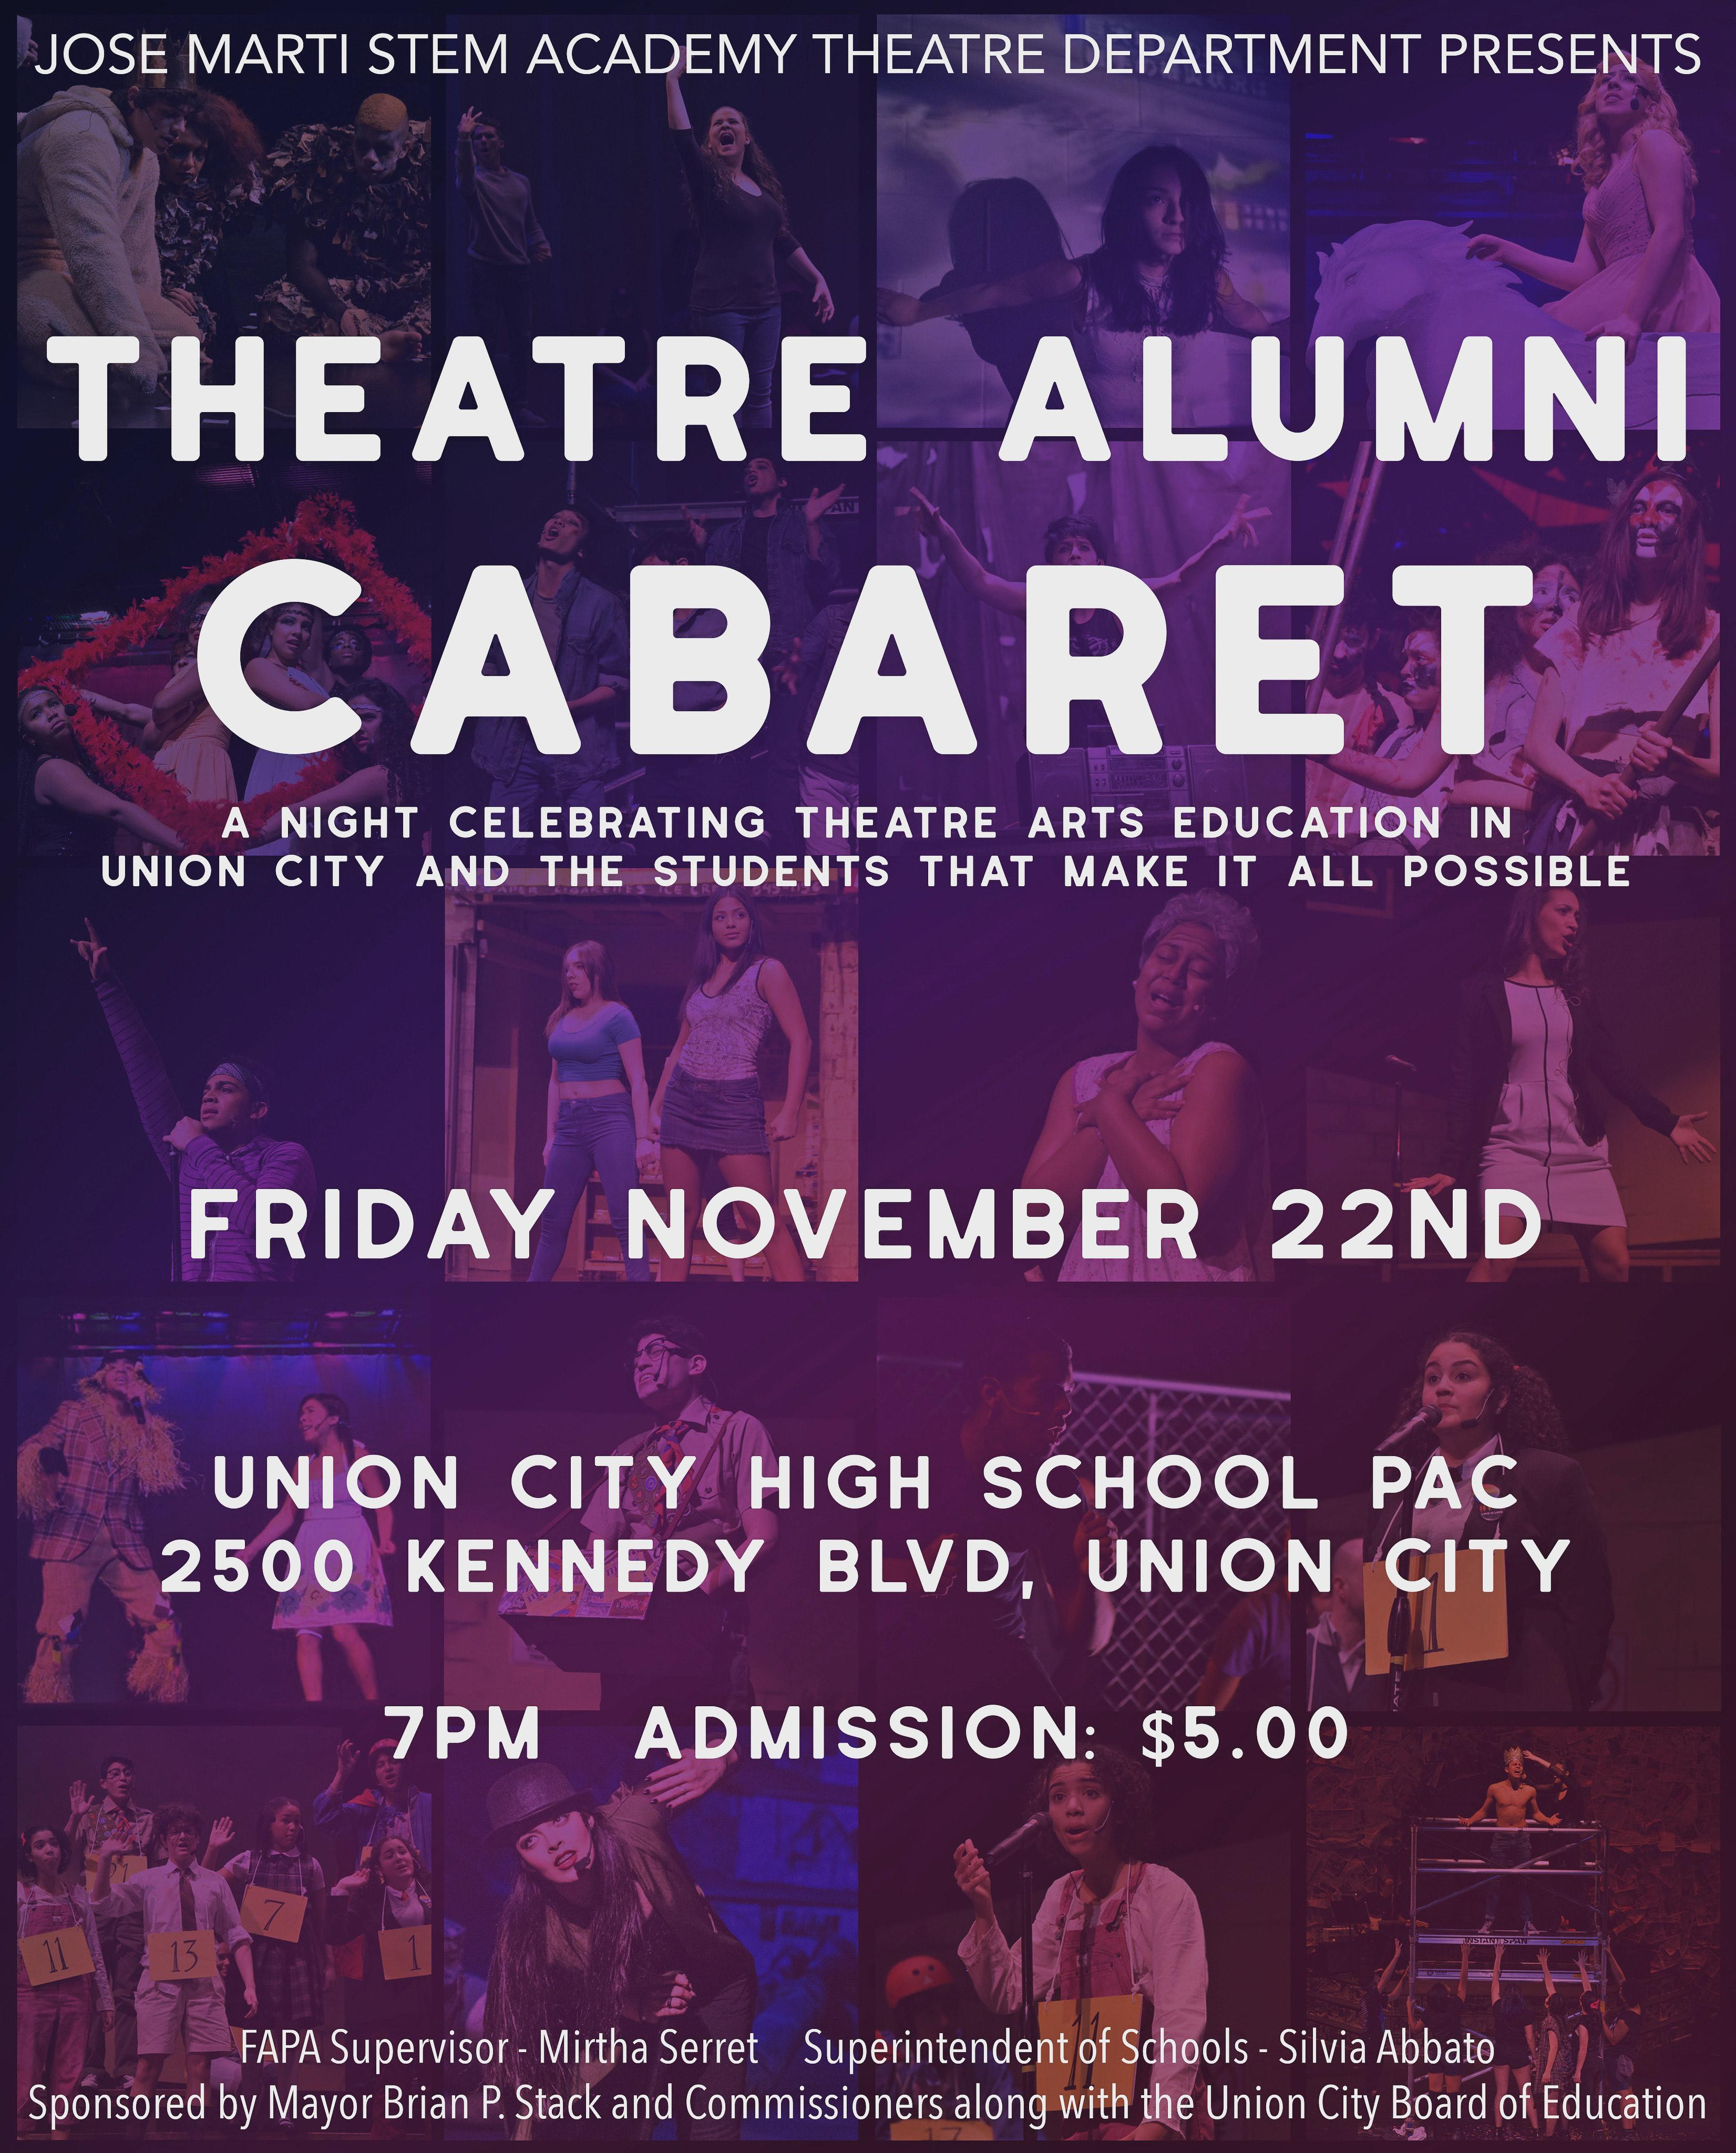 allumni cabaret flyer